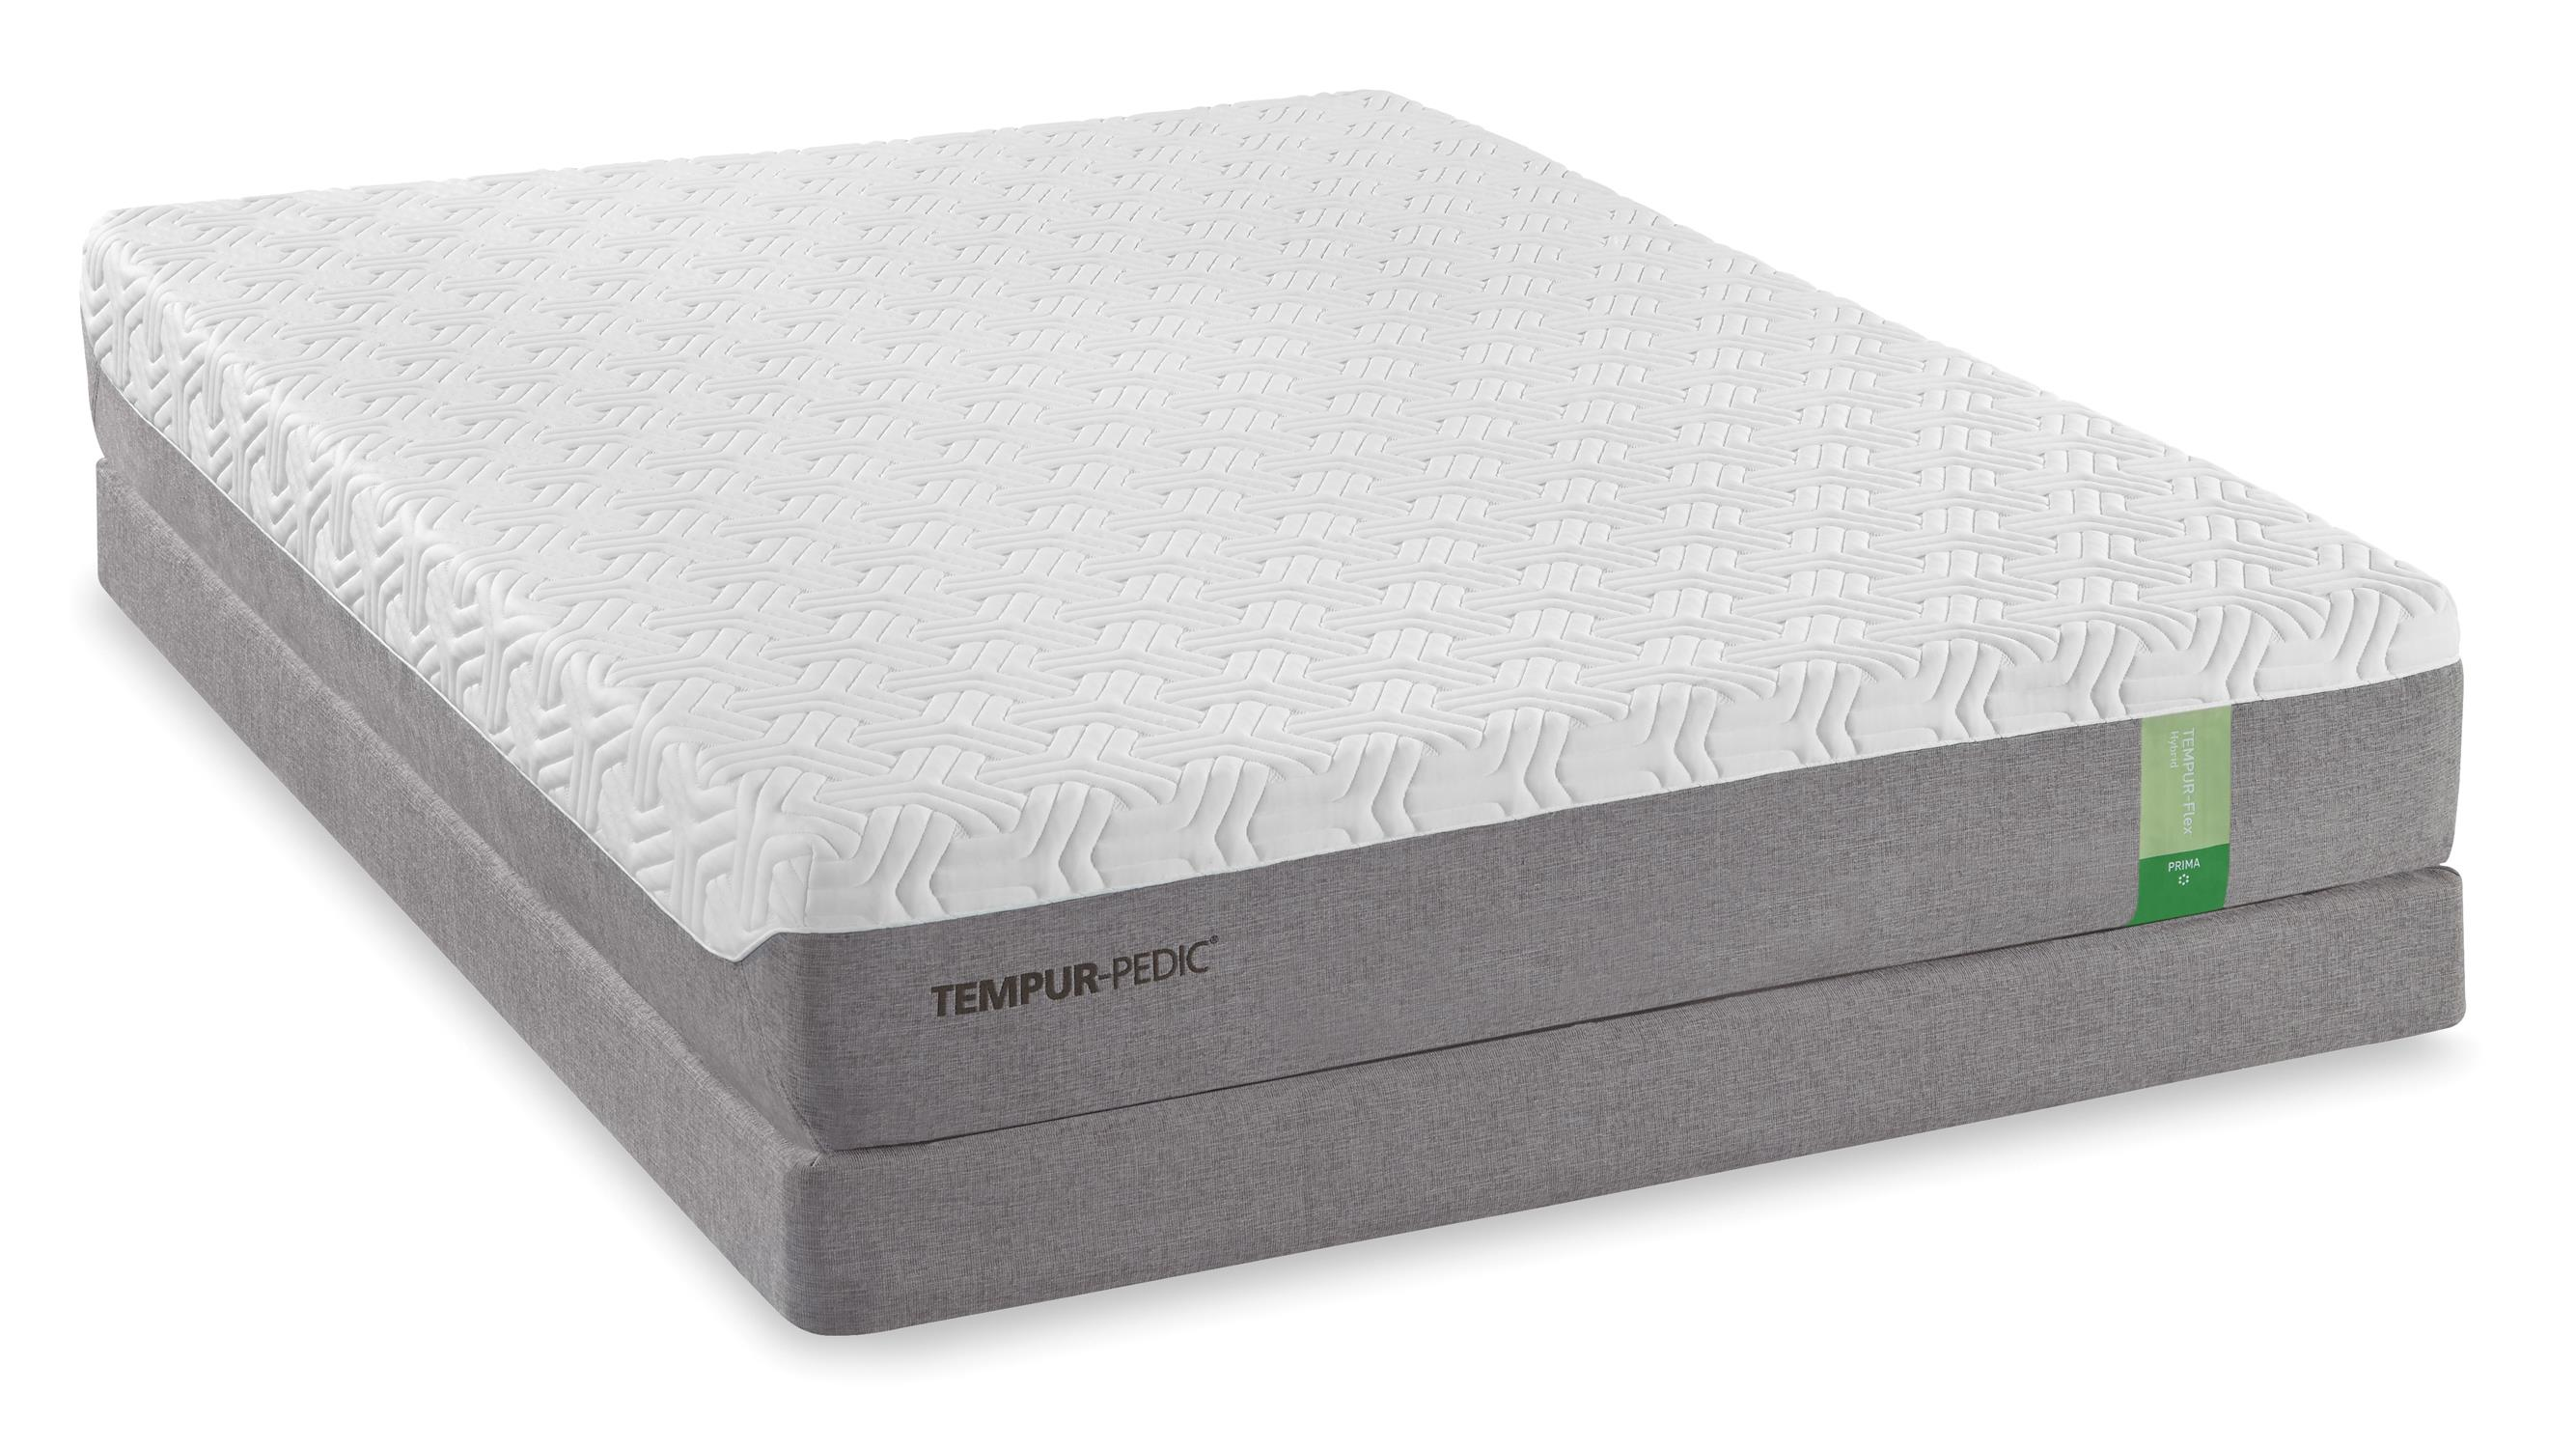 Tempur-Pedic® TEMPUR-Flex Prima Cal King Medium Firm Mattress Set - Item Number: 10115280+2x20510190